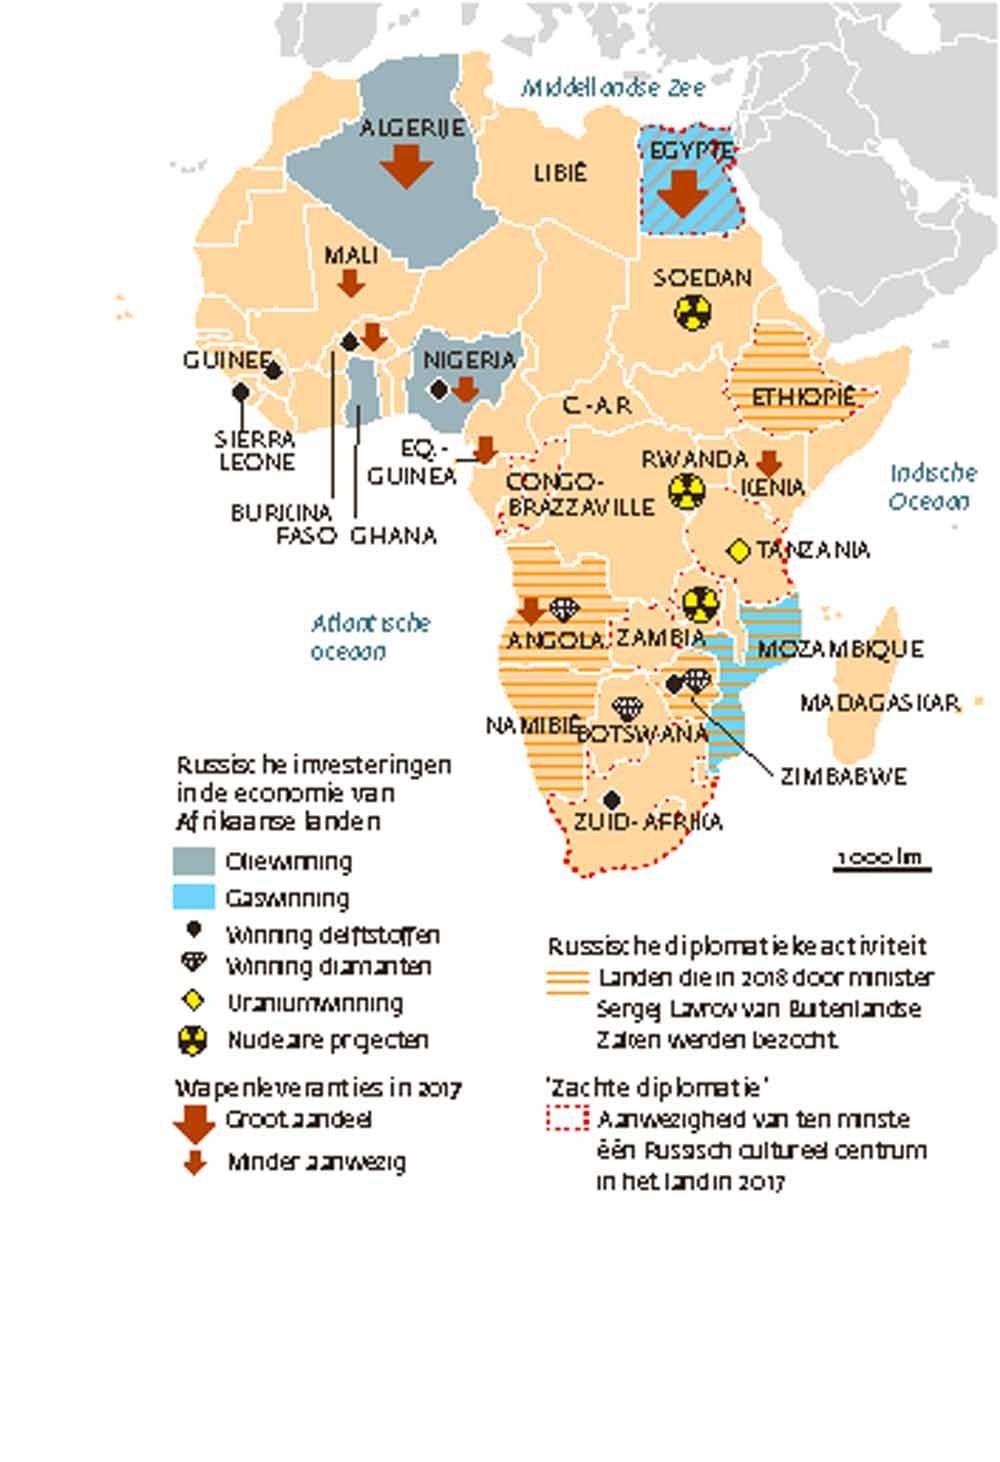 Olie, mineralen, wapens: Russische invloed in Afrika